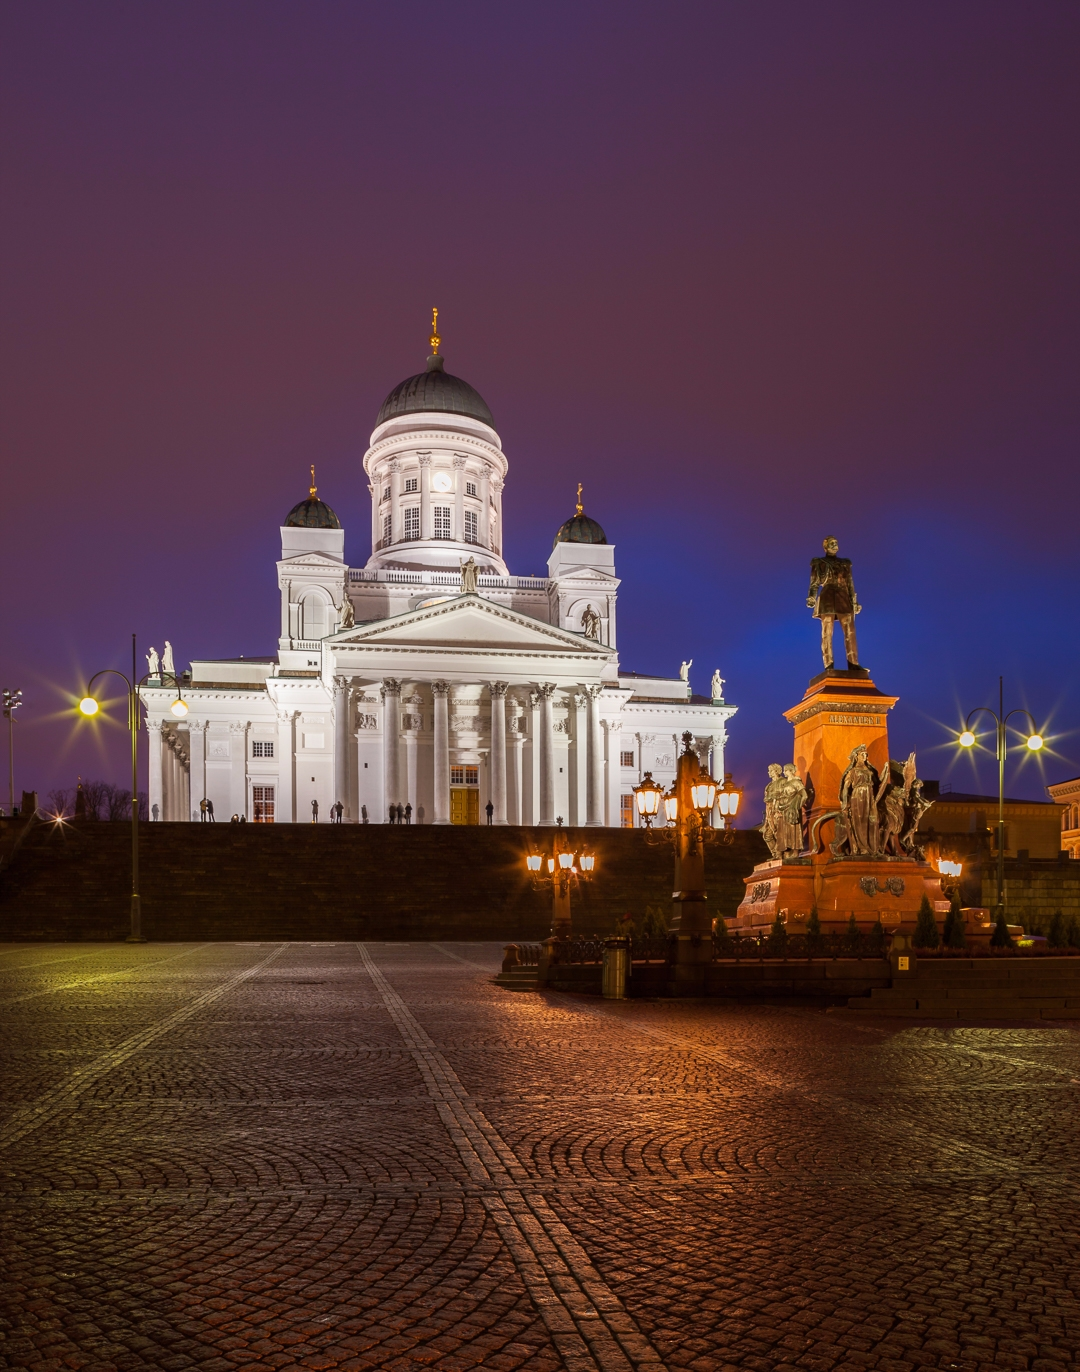 Senate square, Helsinki - photography - anttitassberg | ello